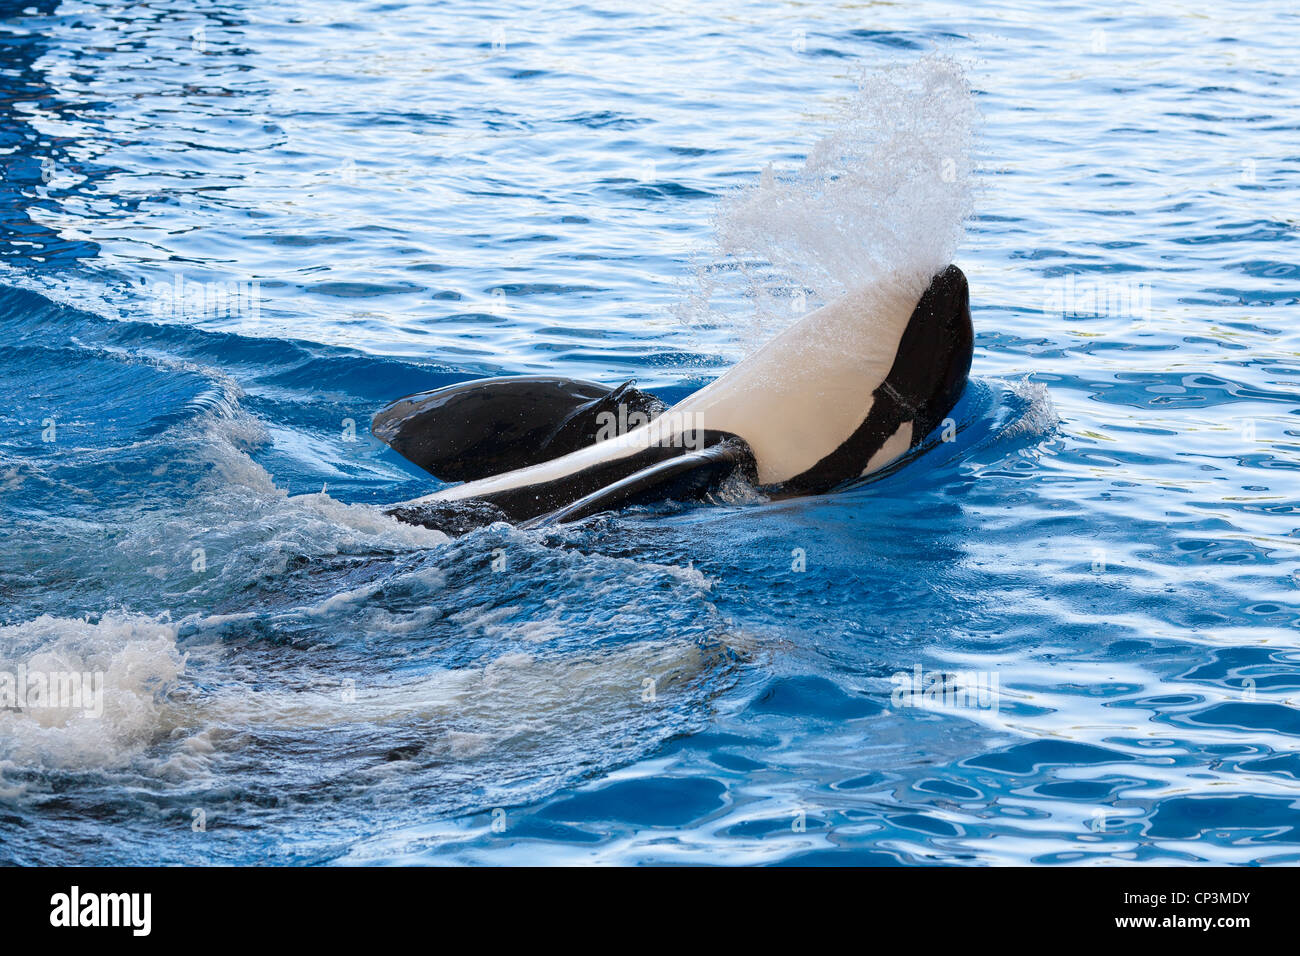 Orca - Stock Image